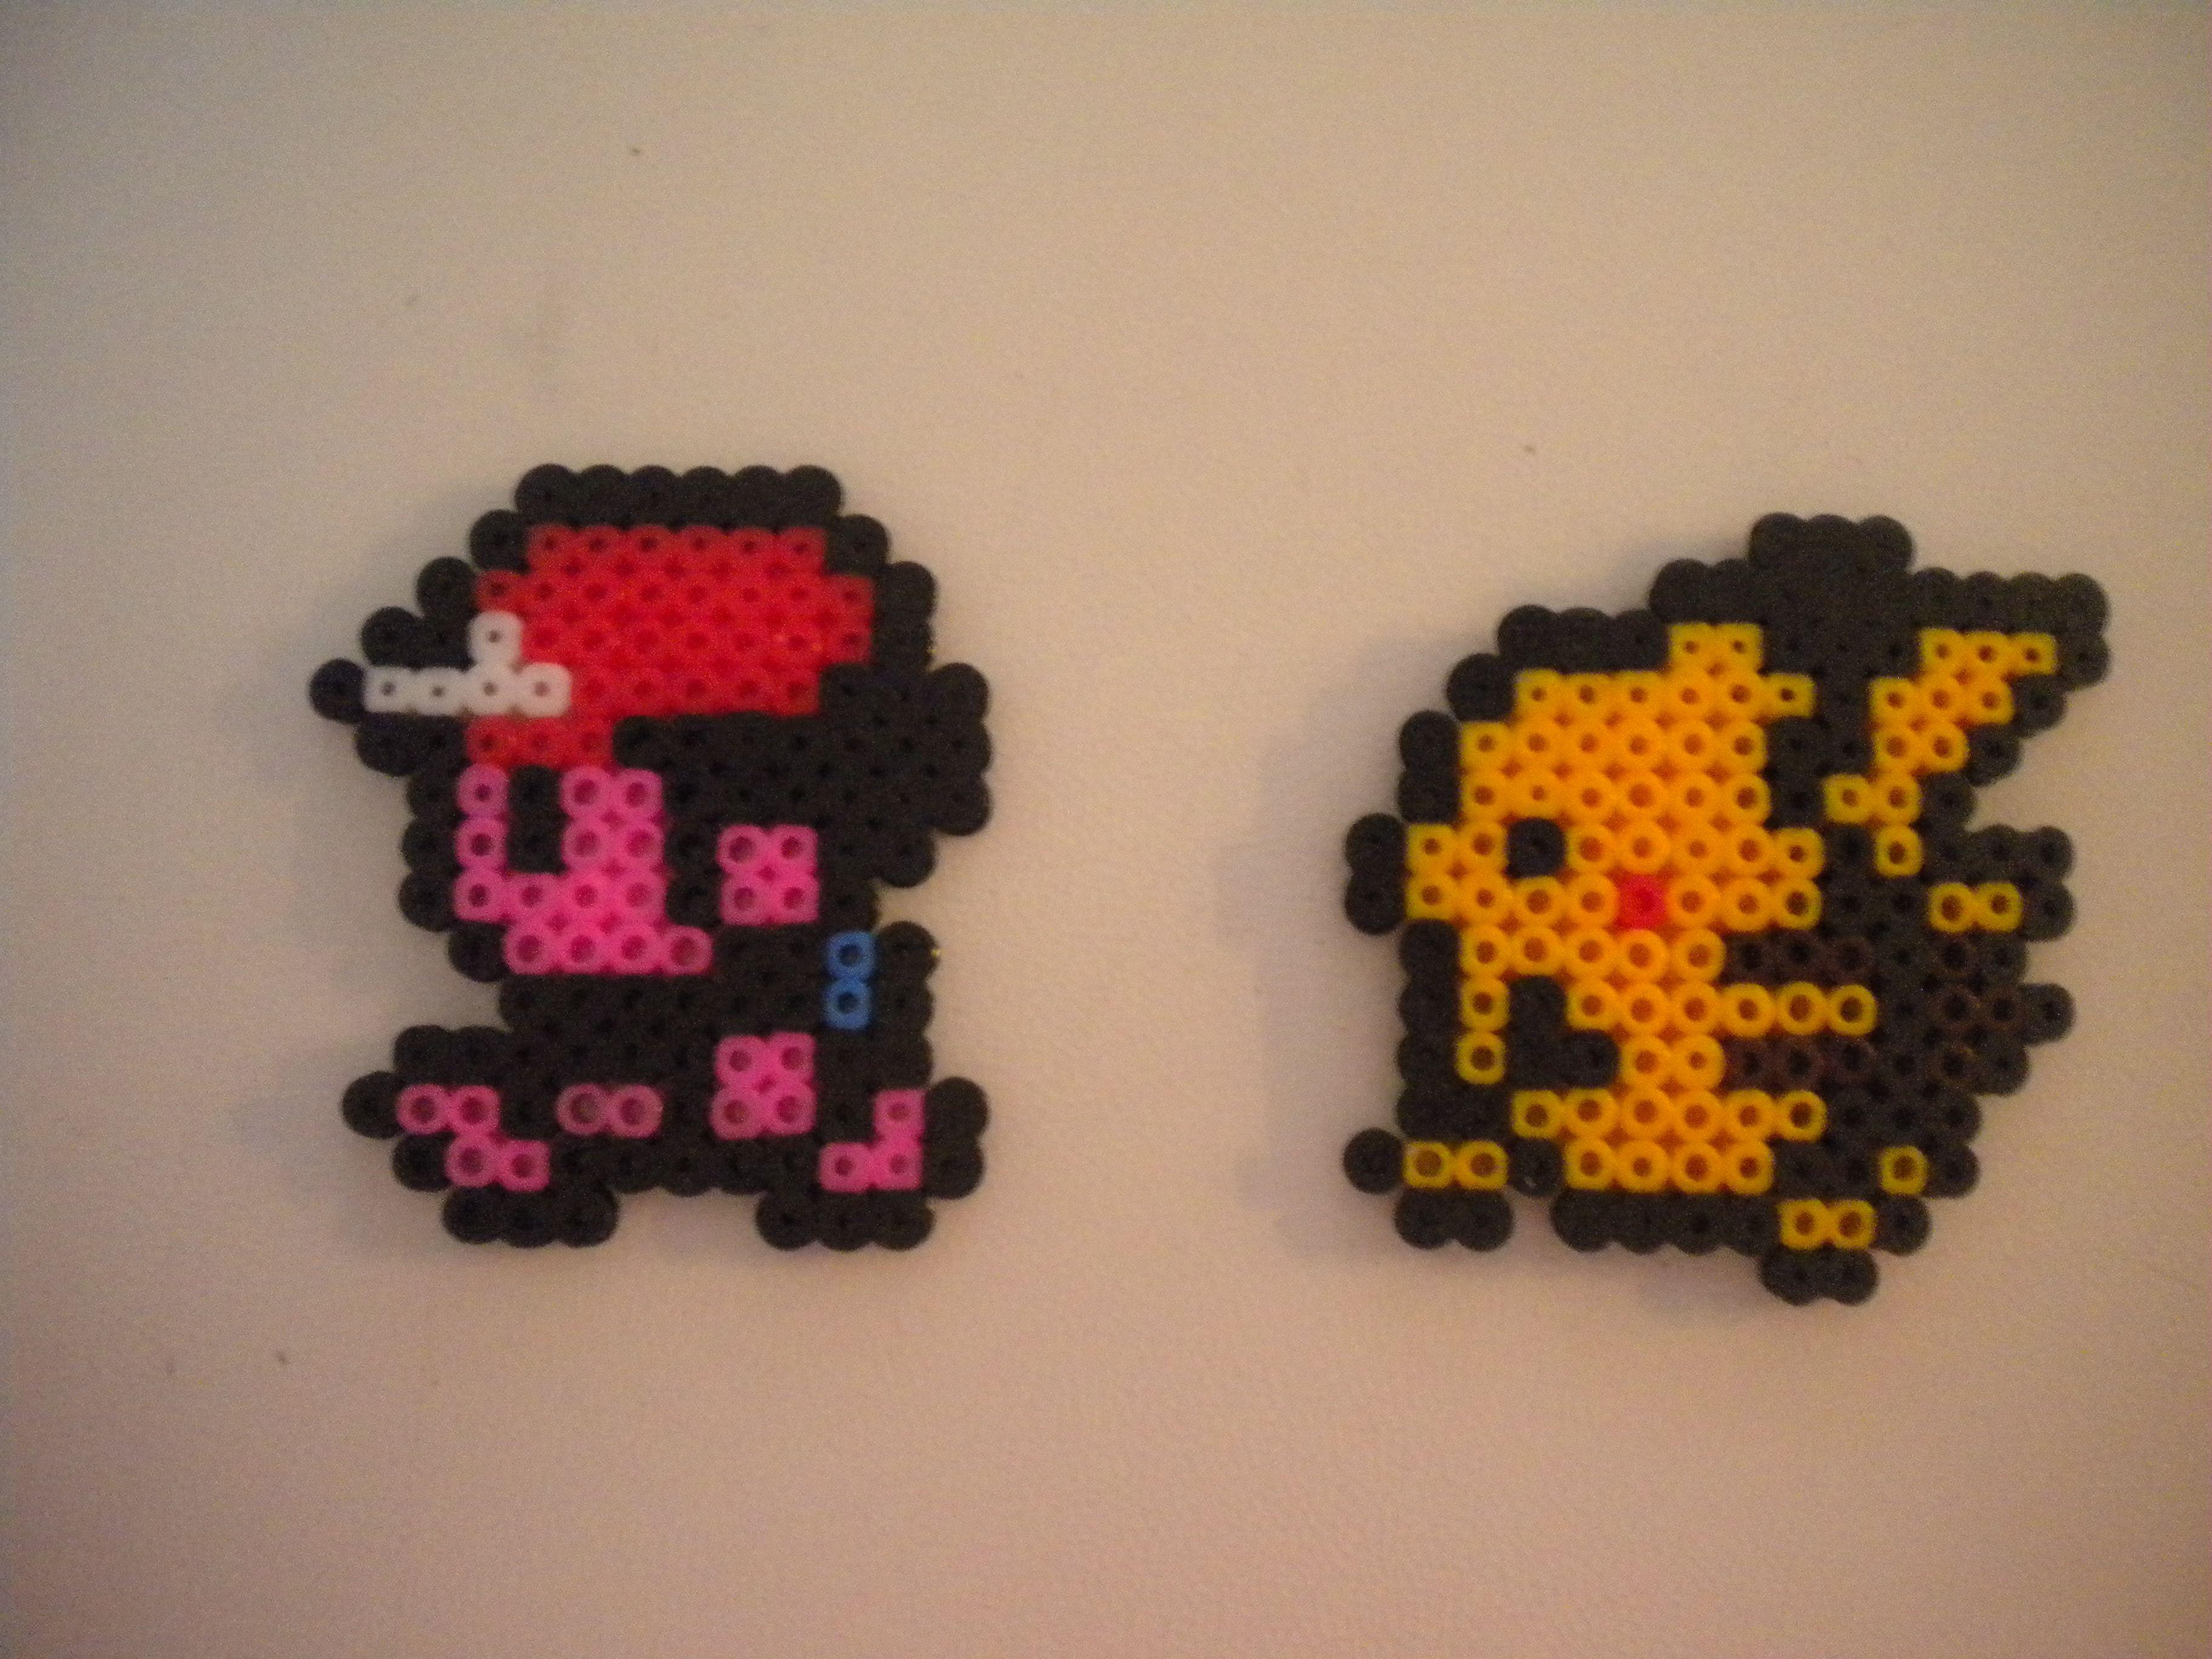 Ash & Pikachu C: